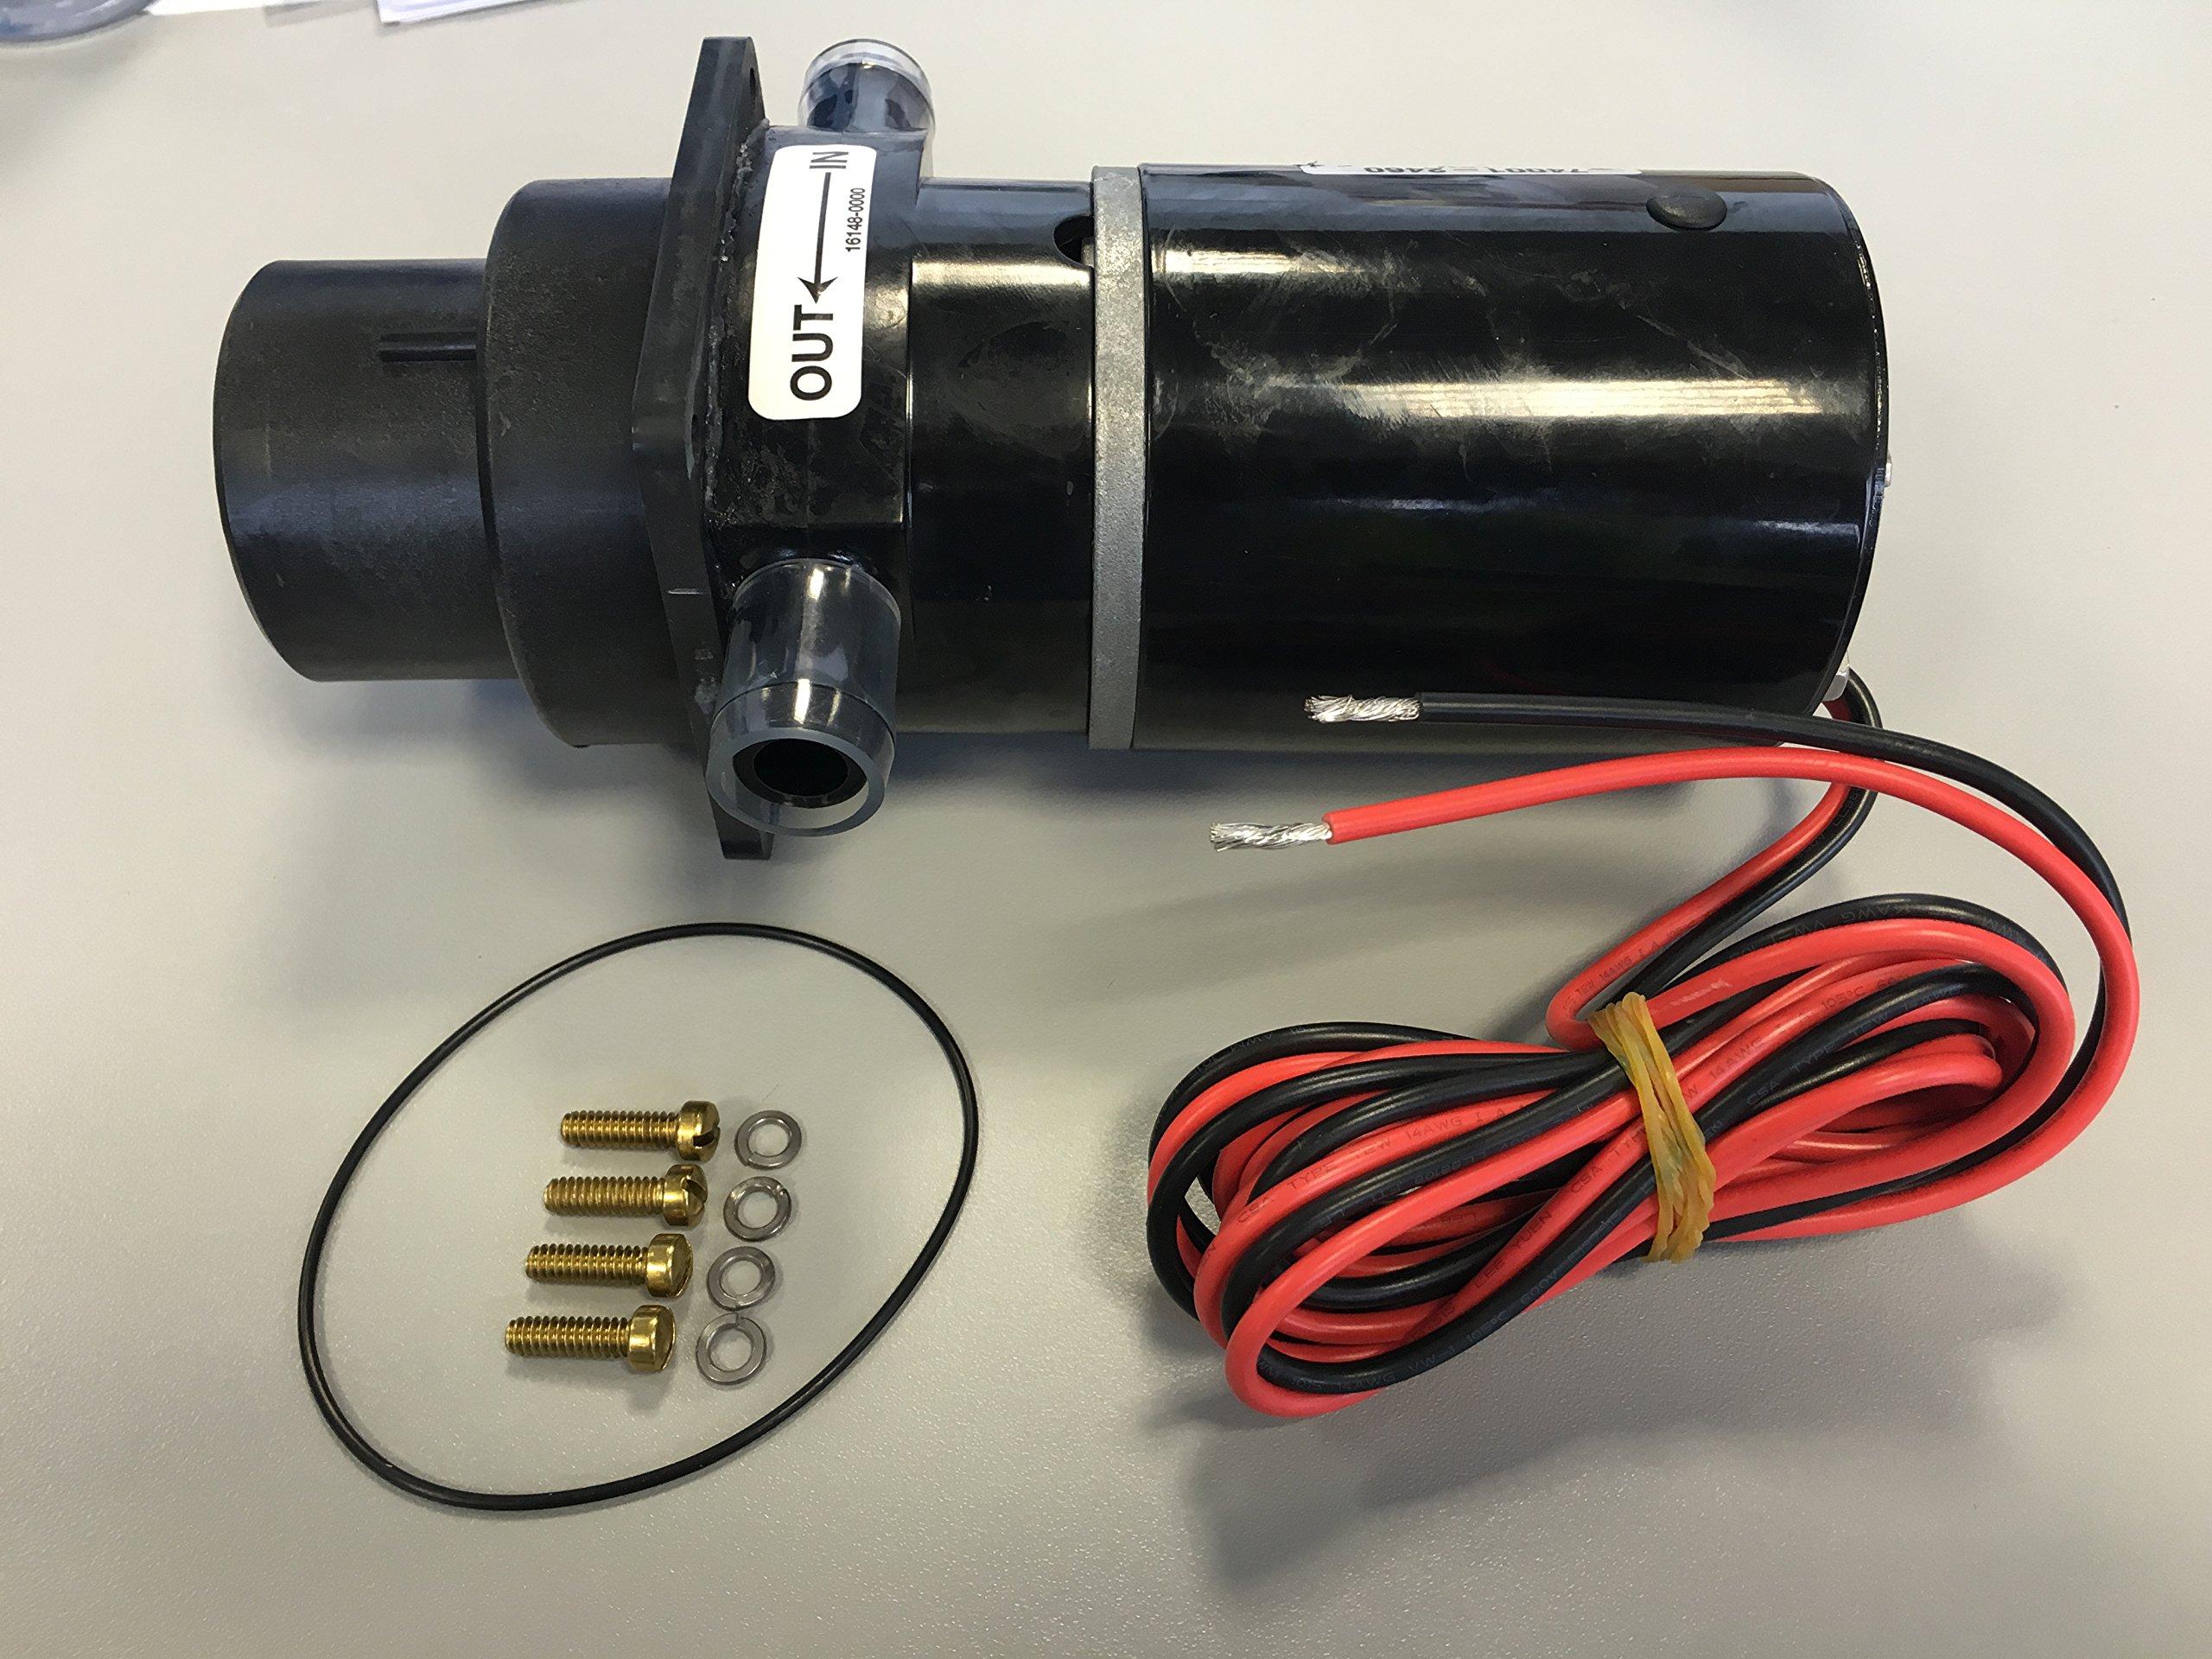 Jabsco 37041-0010 Marine Marine Electric Toilet Macerator Sub Assembly Kit, 12-Volt, 37010-Series,Black